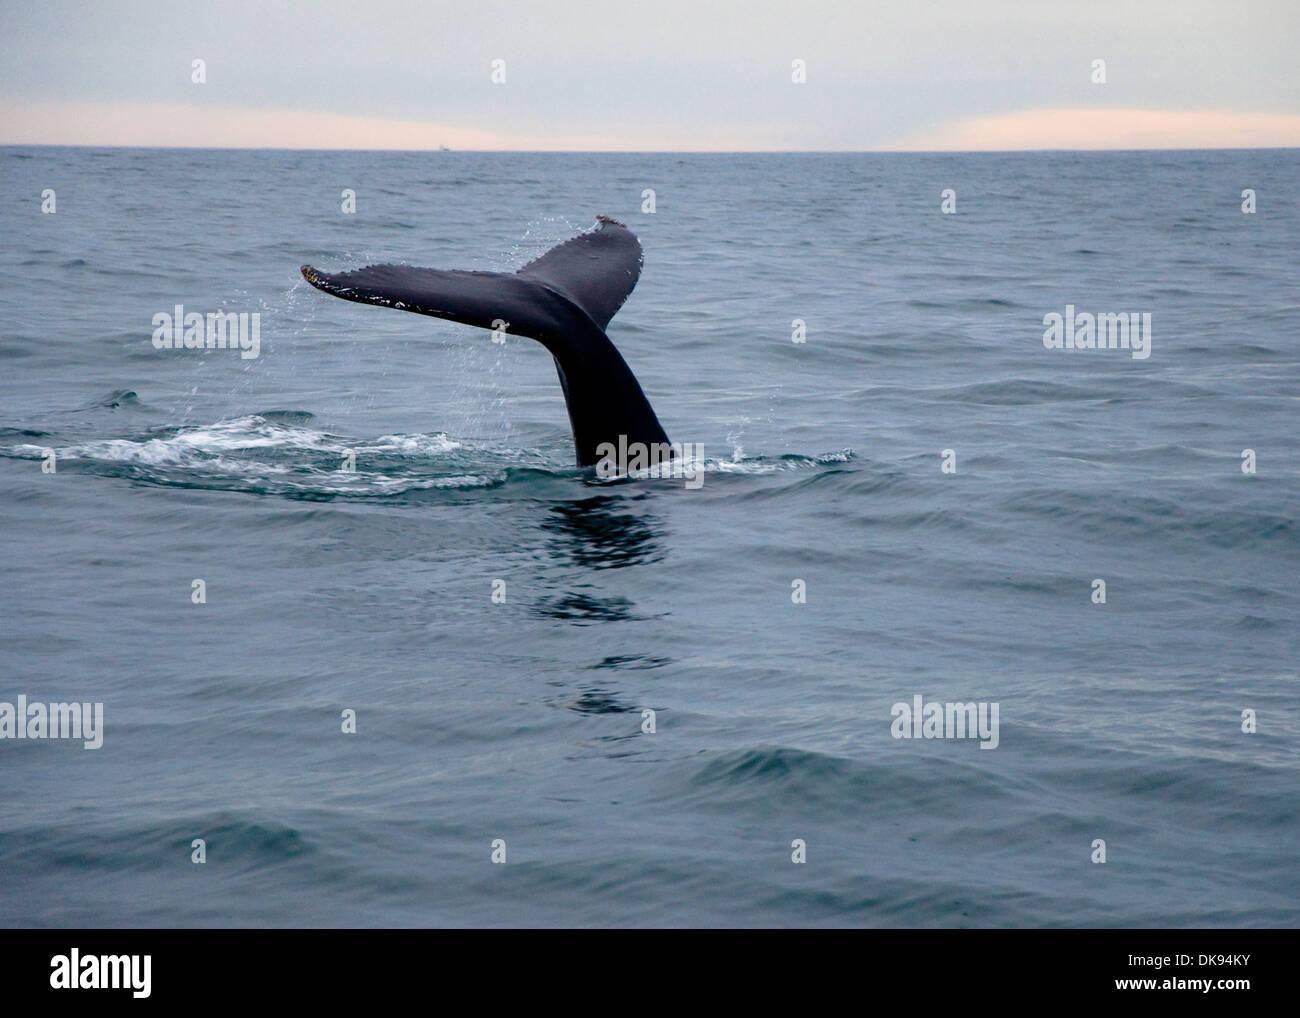 Humpback whale, Husavik, Iceland - Stock Image